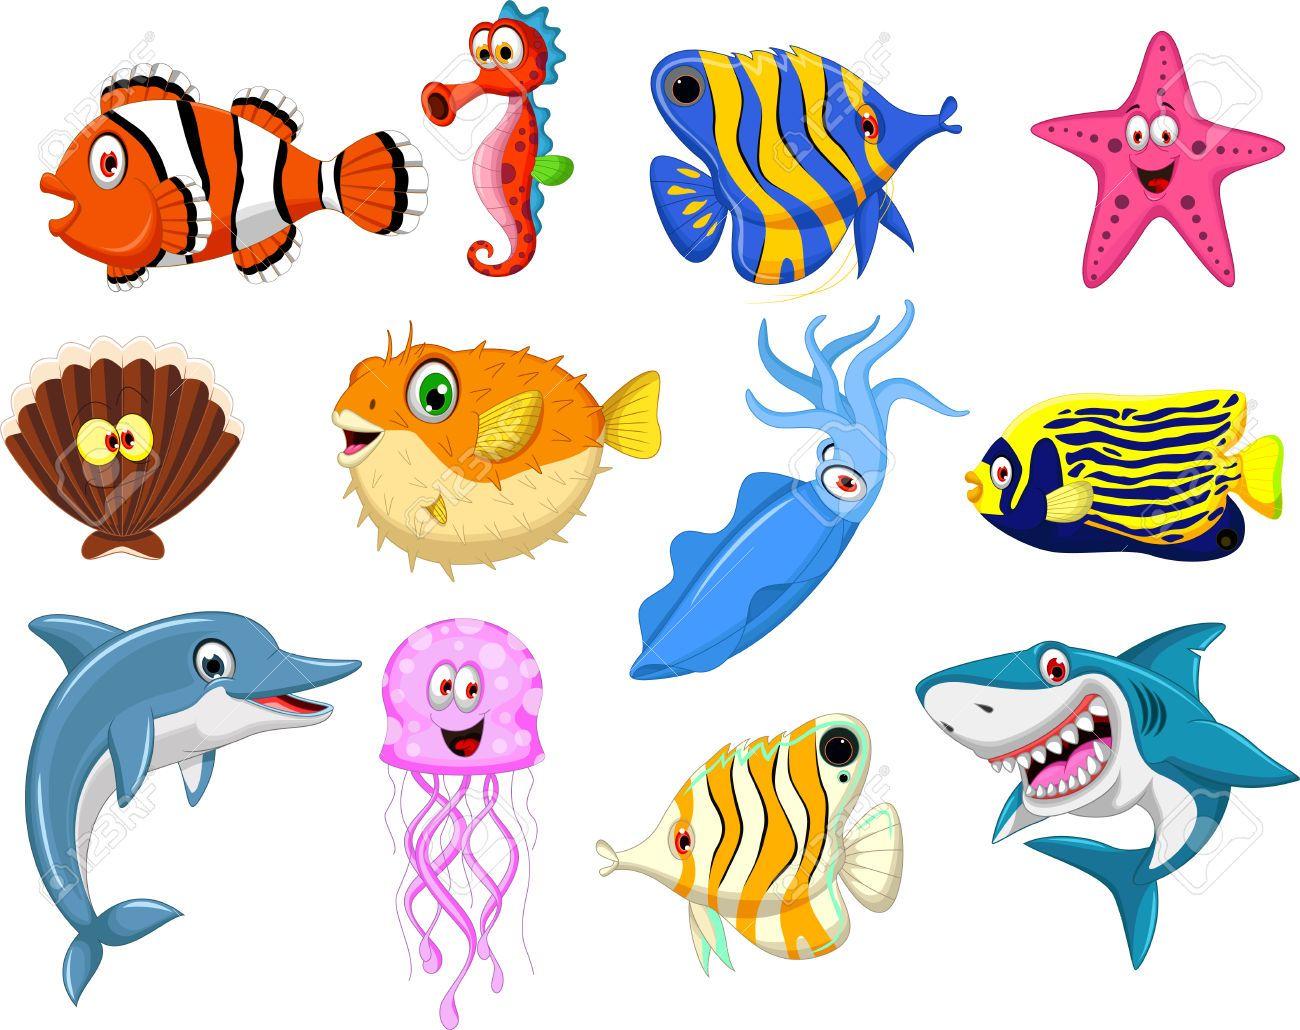 Colecci n de dibujos animados la vida marina - Clip art animali marini ...